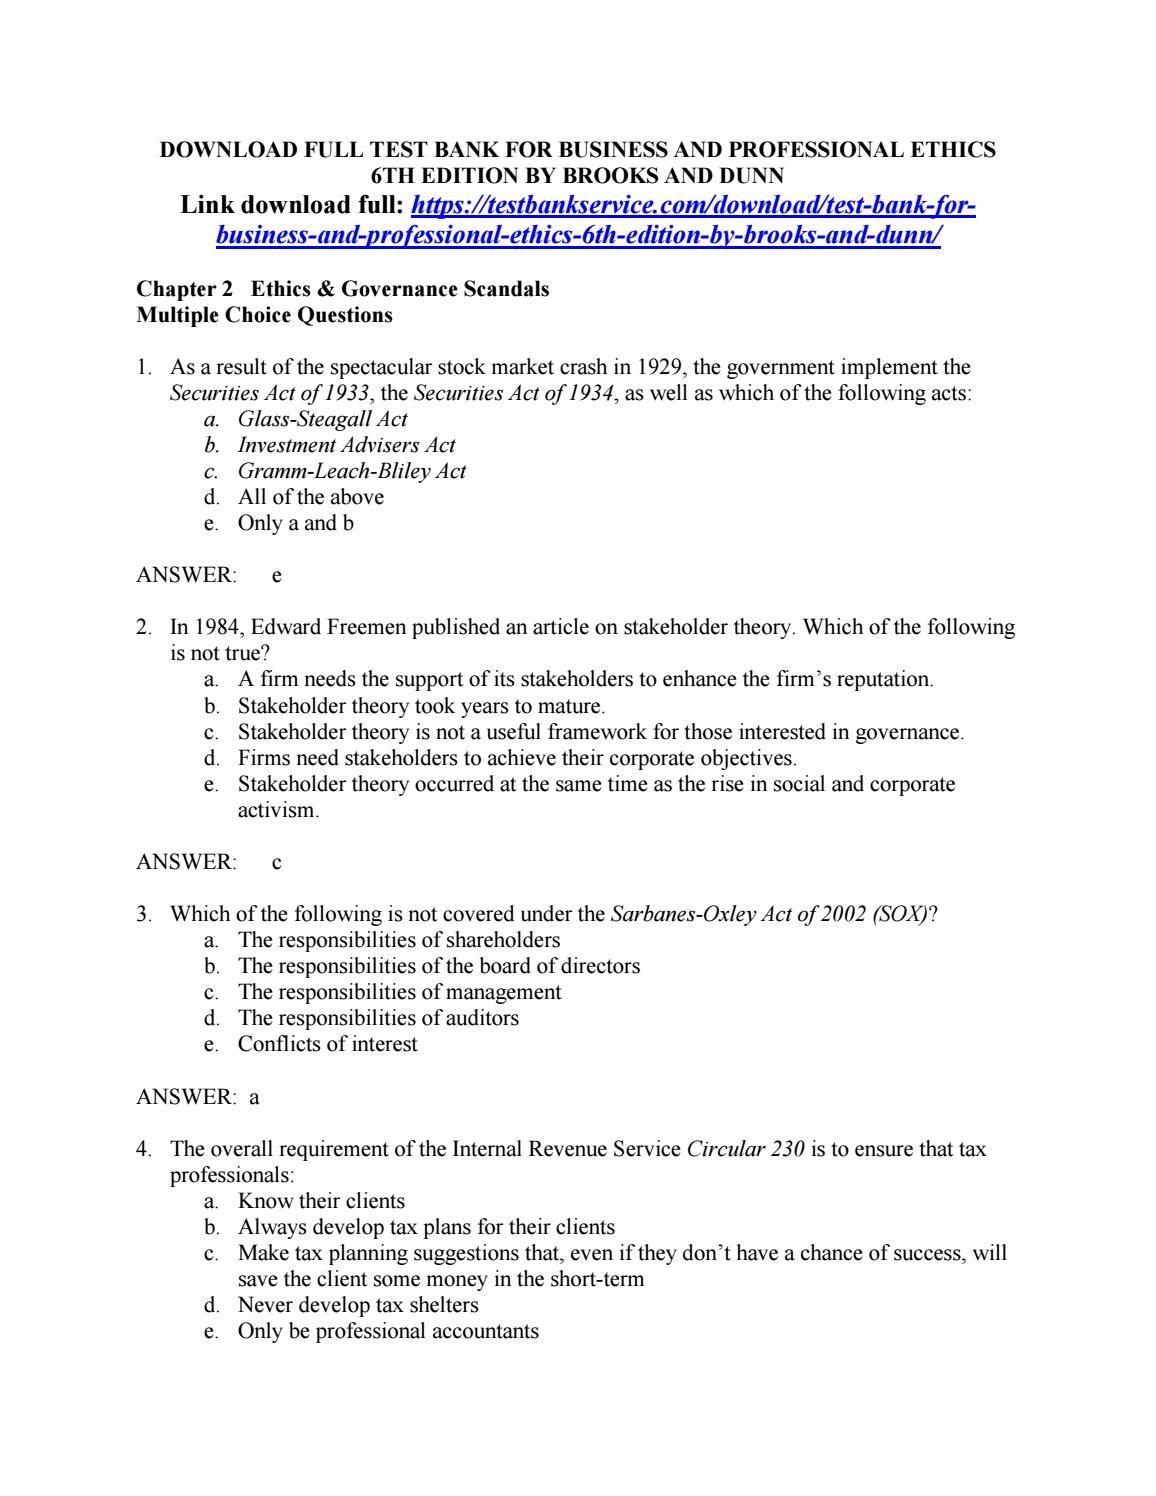 Sox Auditor Sample Resume